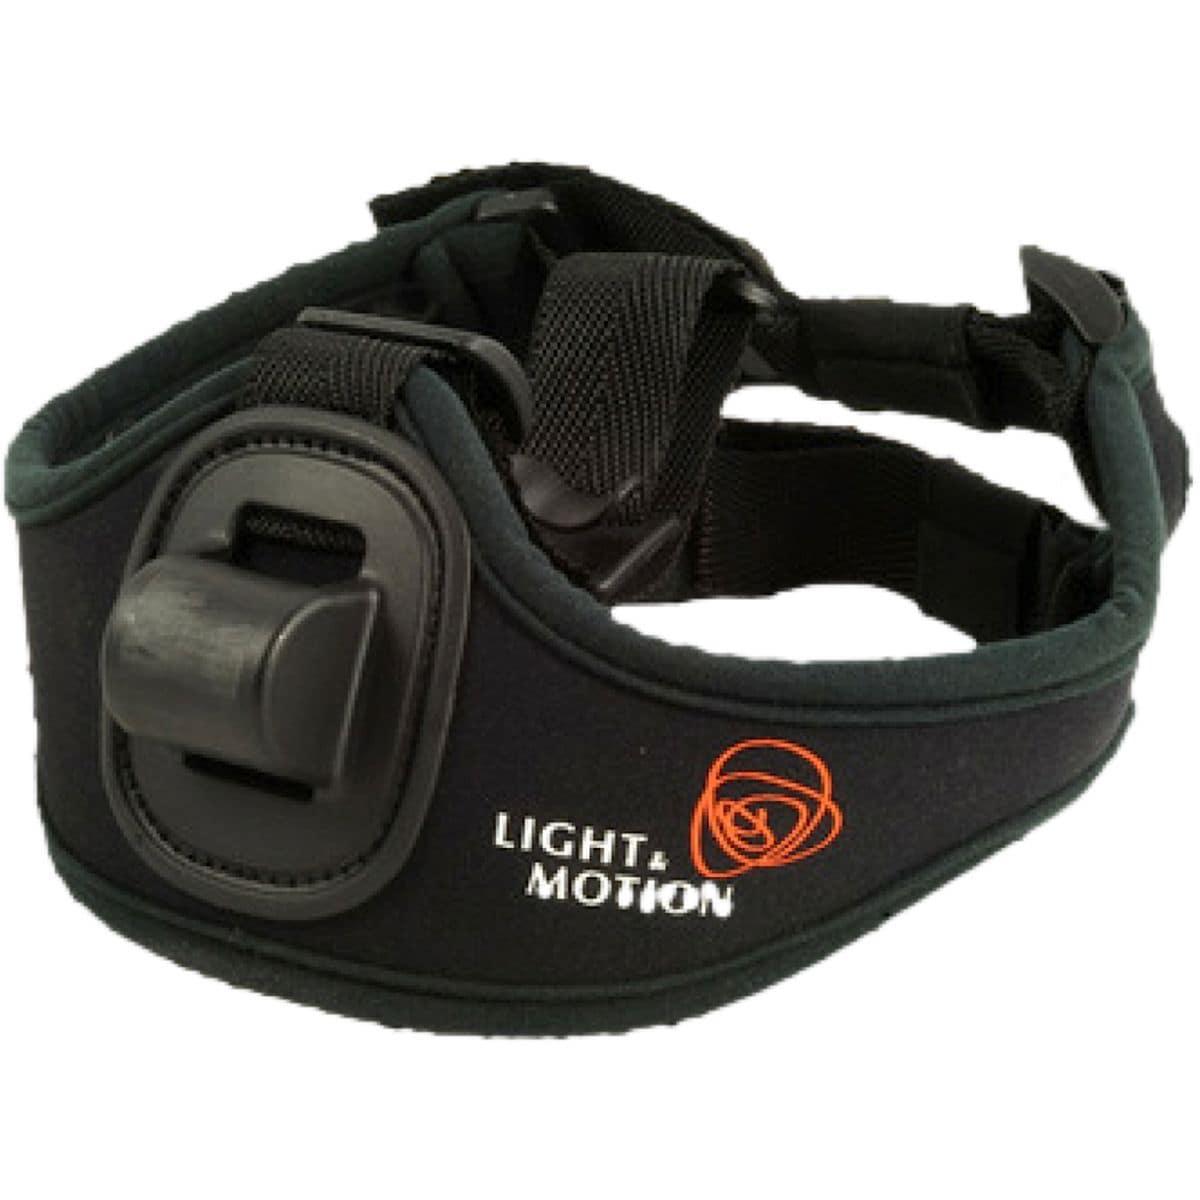 Light & Motion Adventure Head Strap